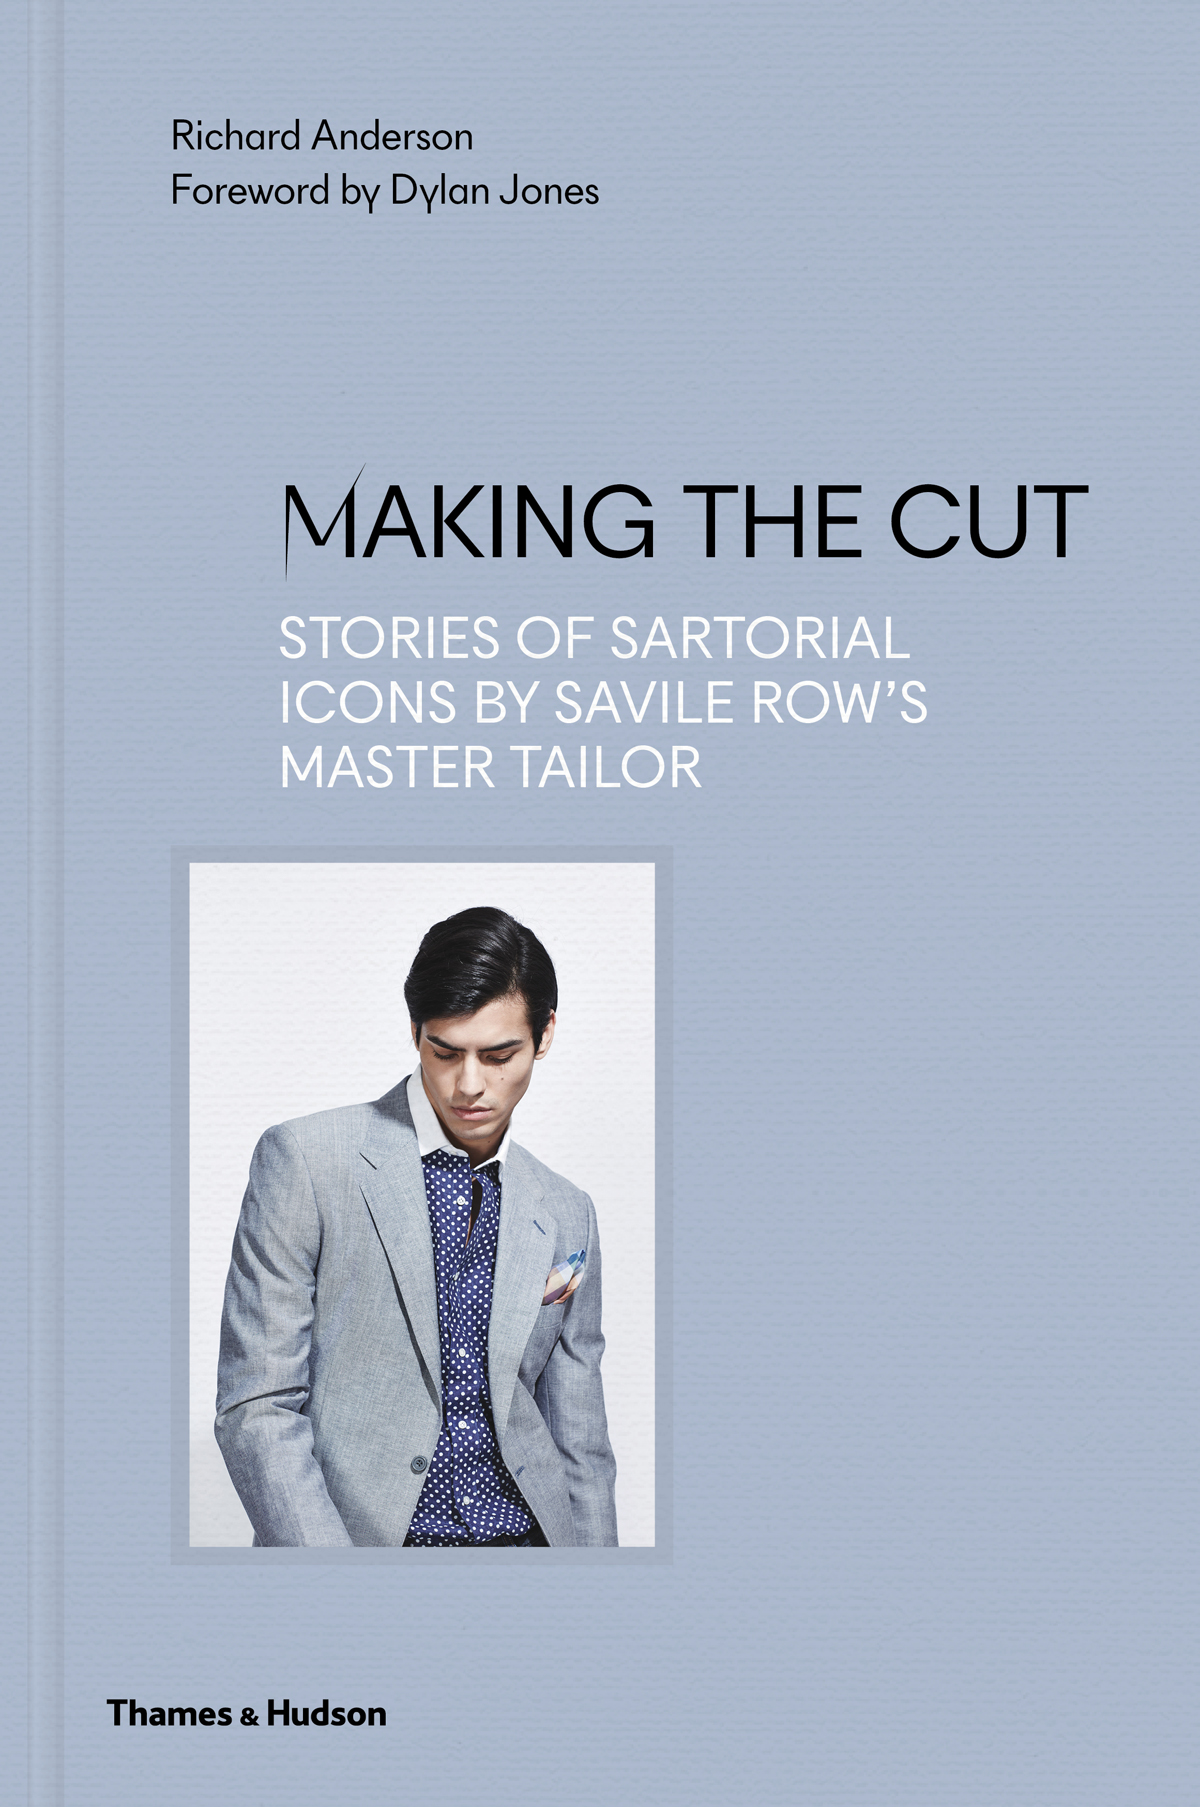 Making the cut (1).jpg